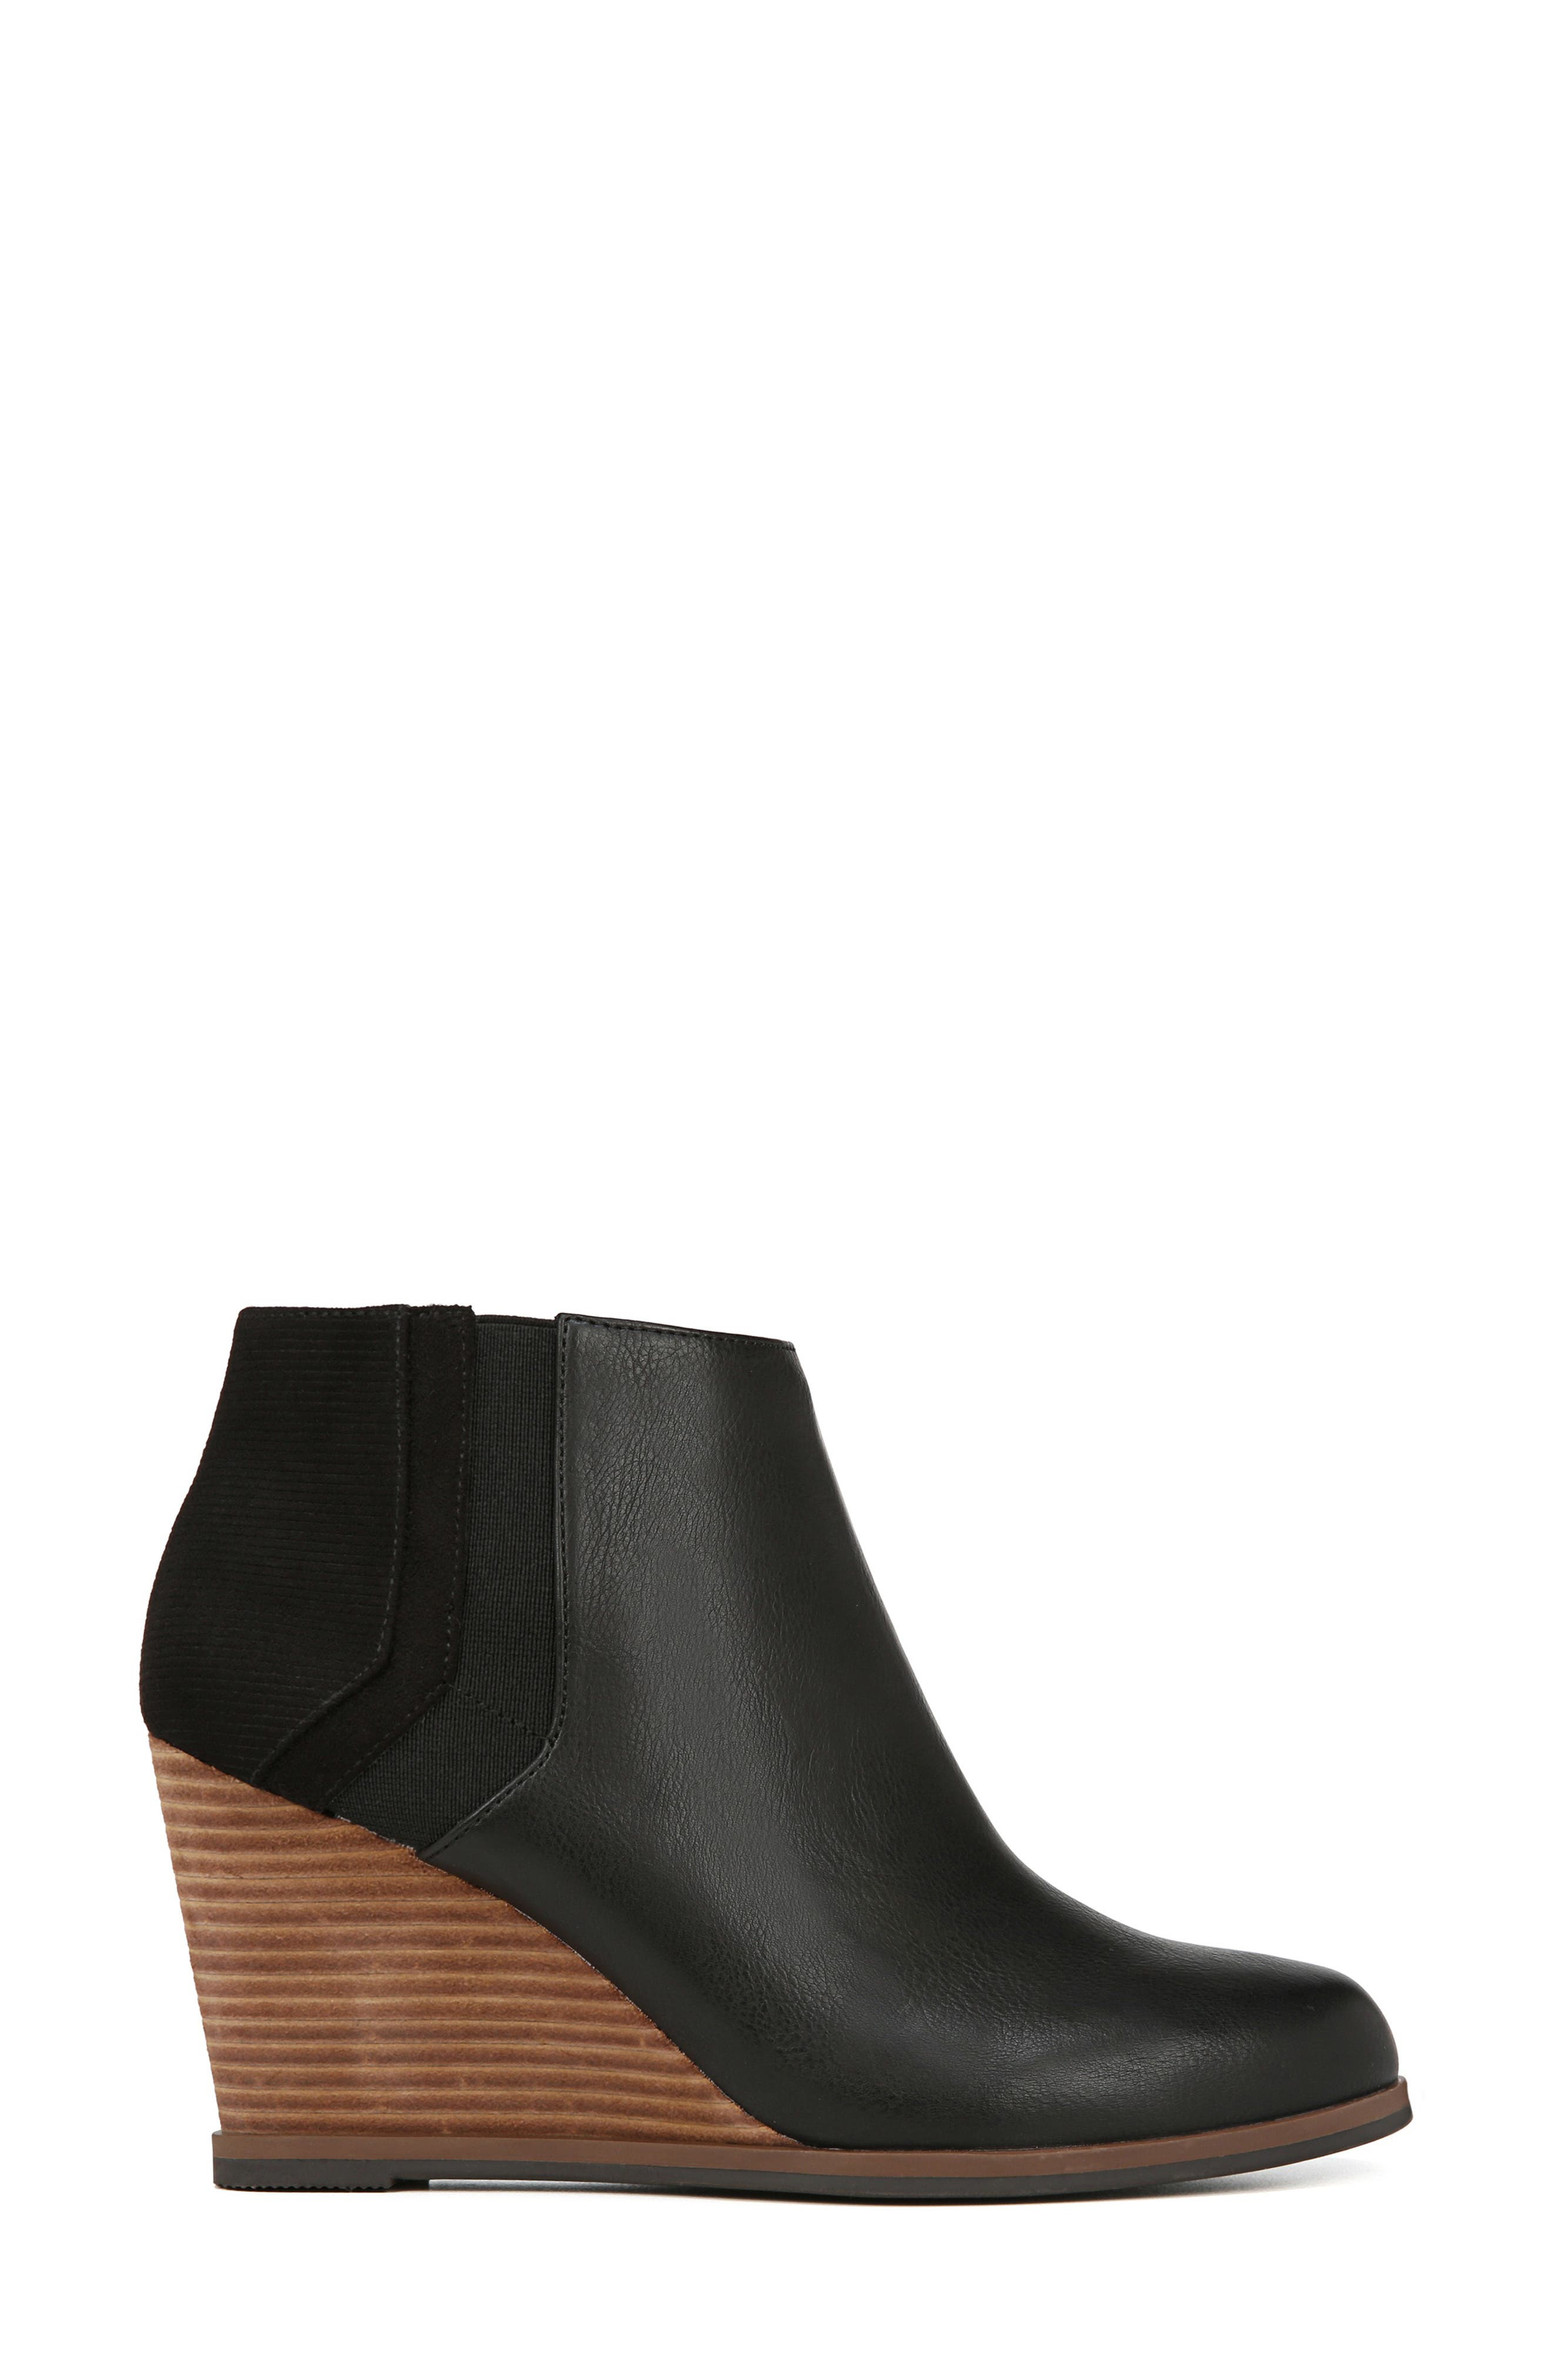 0ea3521ea00b Women s Dr. Scholl s Boots